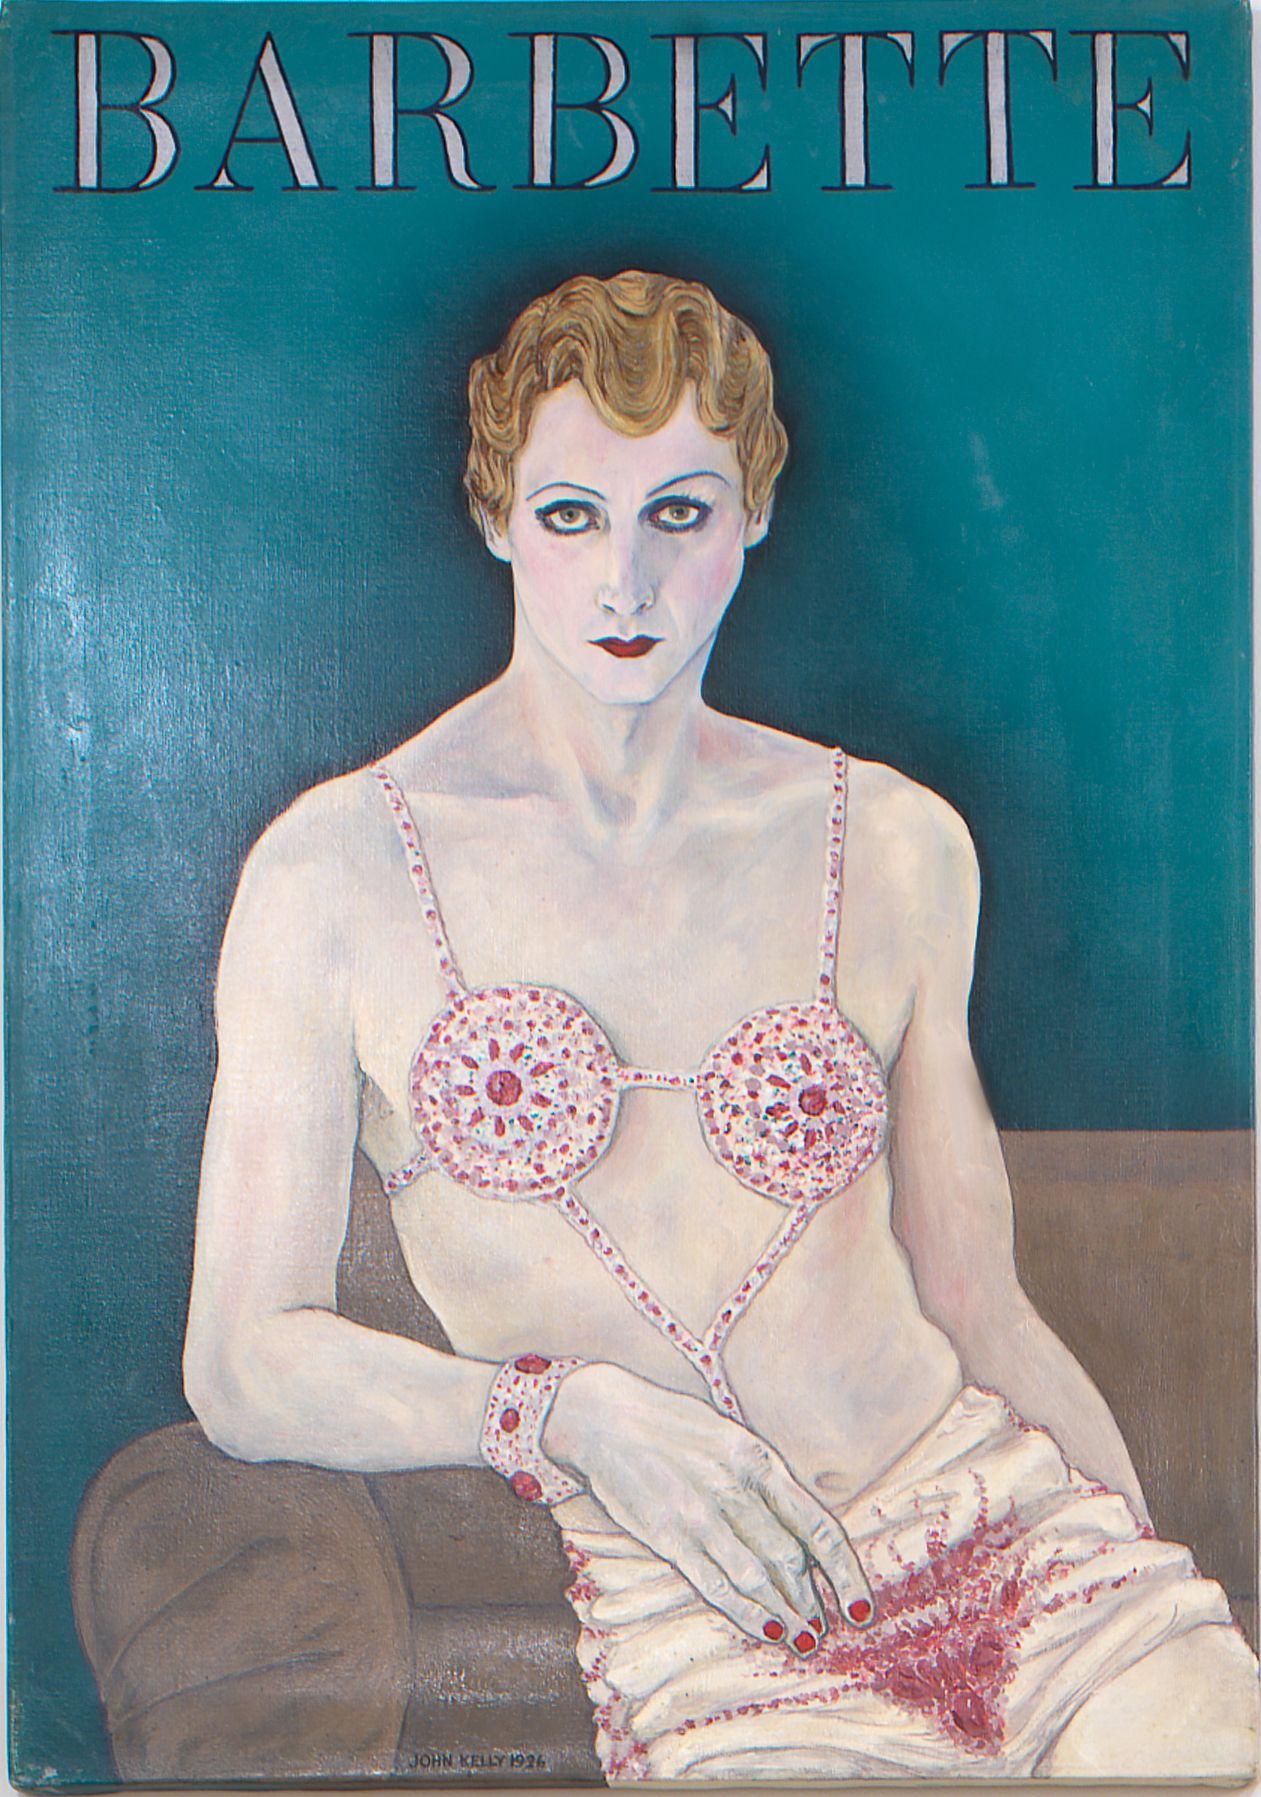 Self Portrait as Barbette, 1926, Oil On Canvas